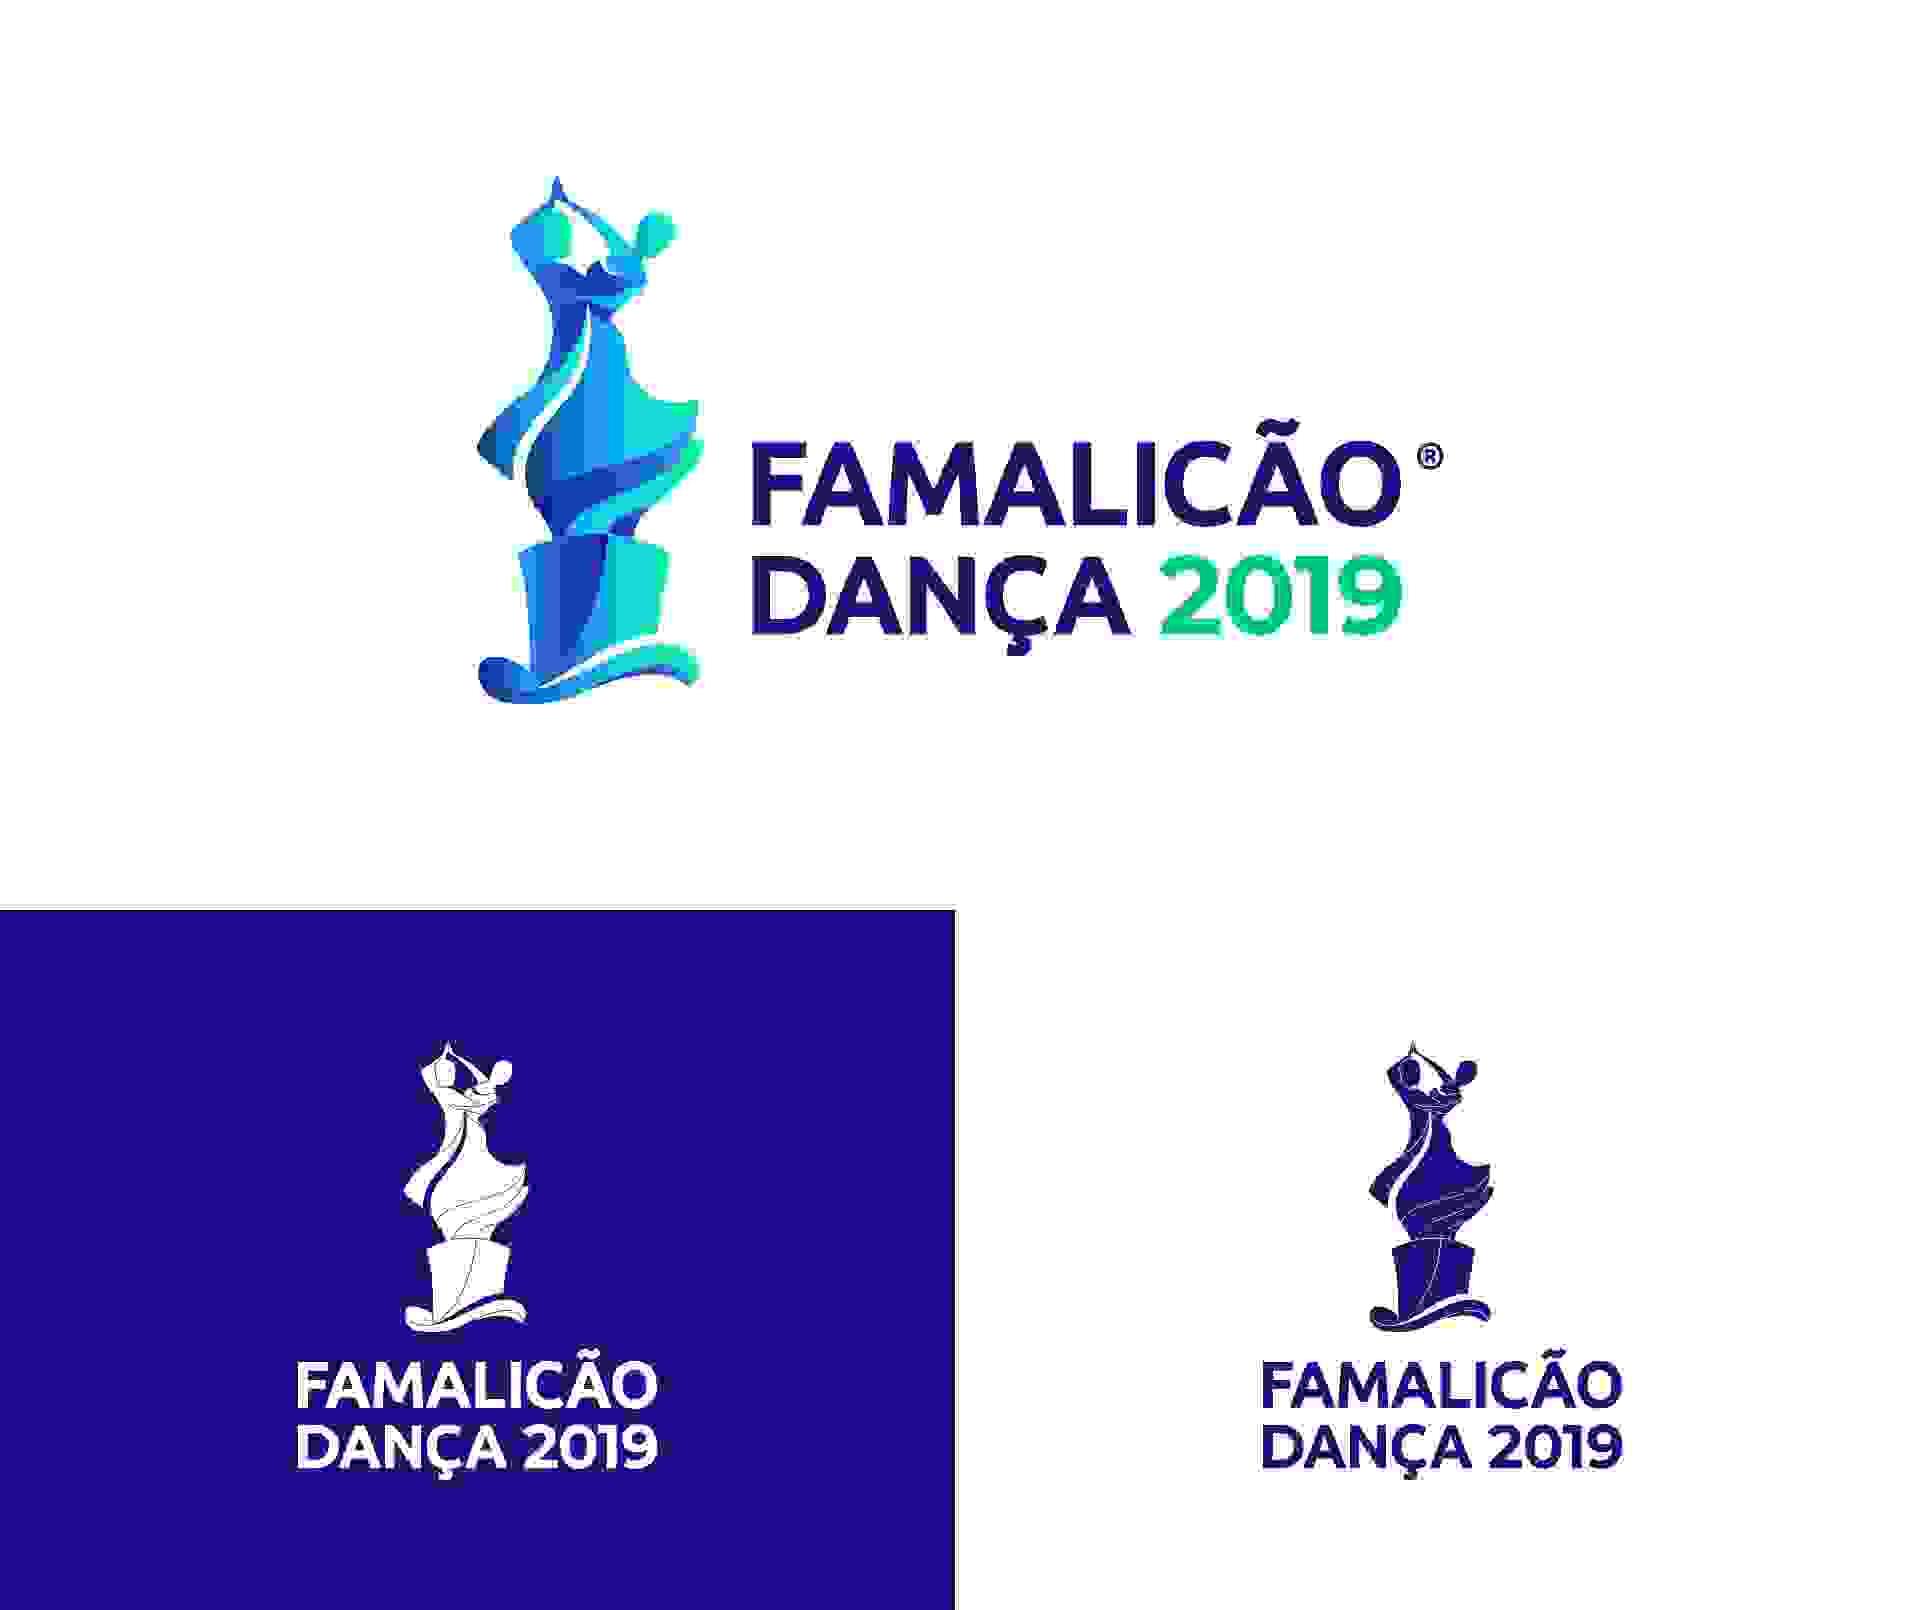 logotipo-famalicao-danca